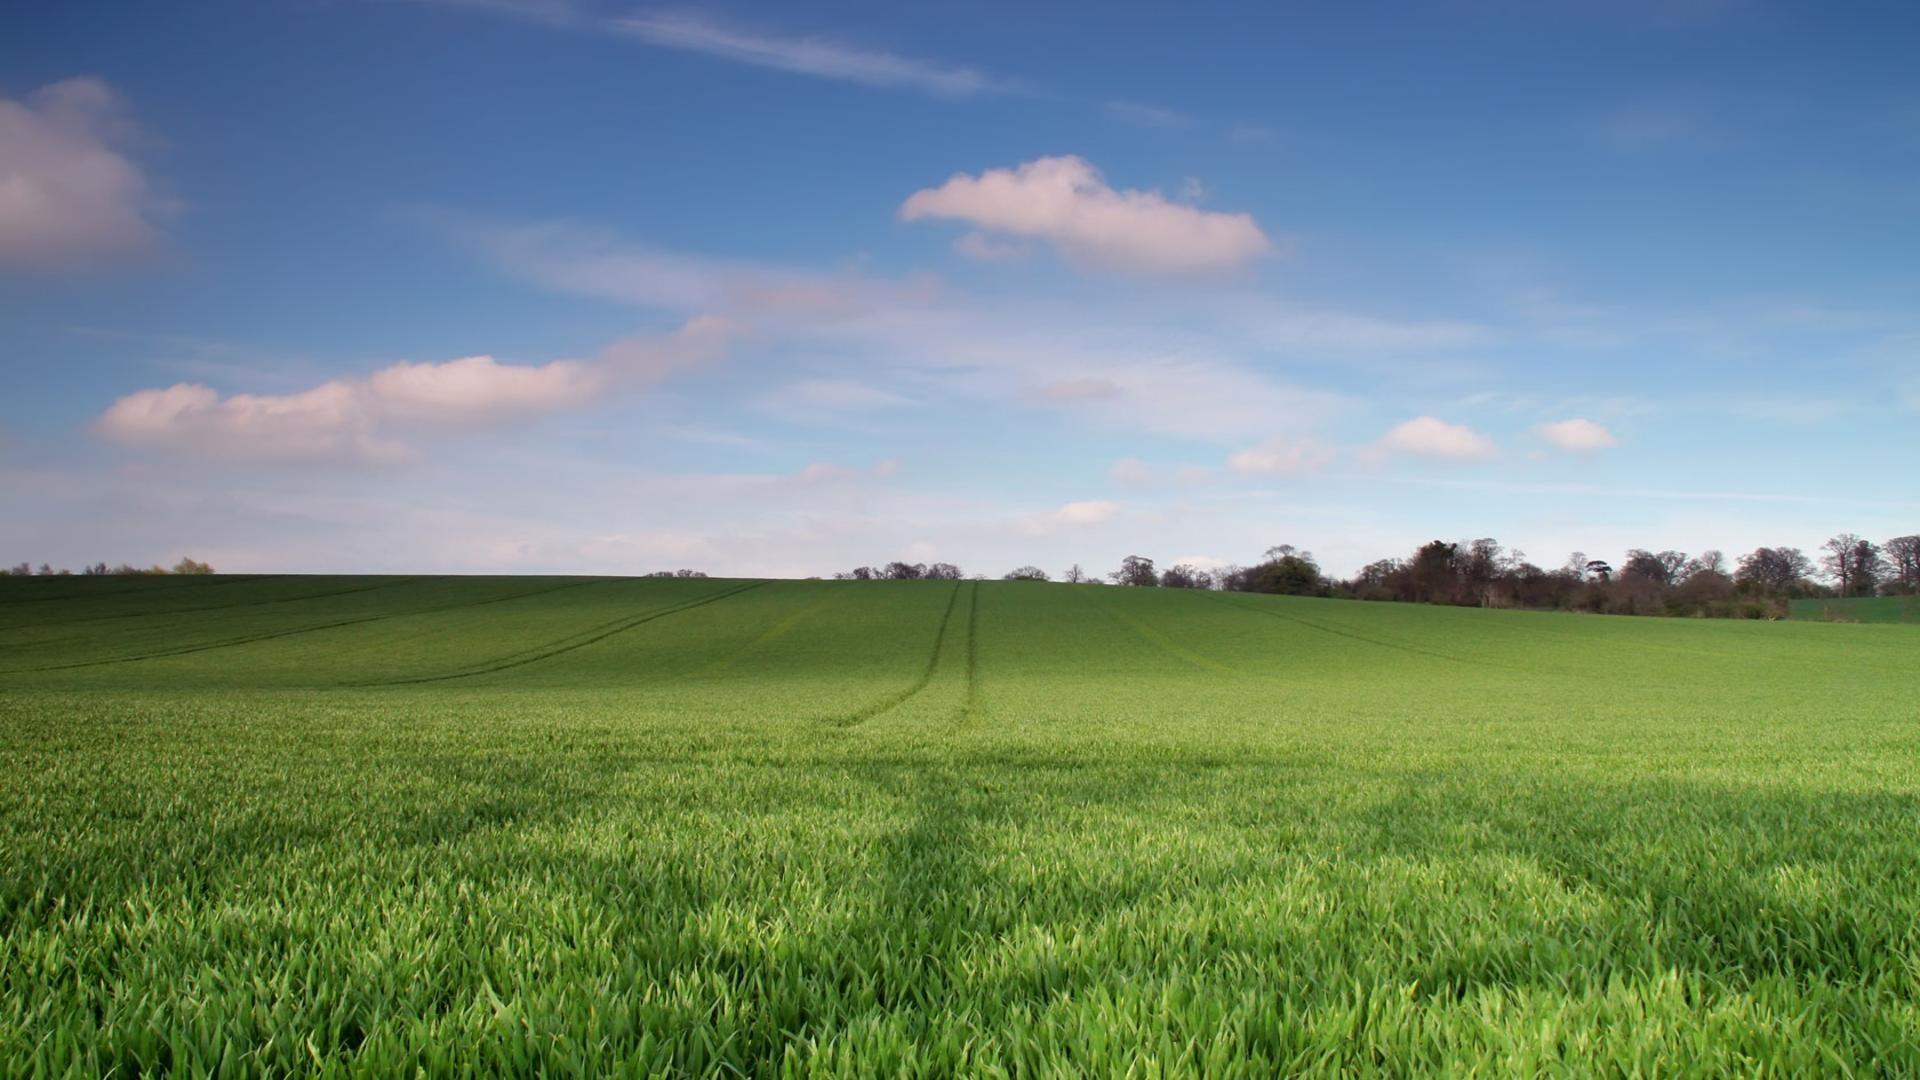 Young green wheat field free wallpaper in free desktop backgrounds category: Fields-backgrounds.